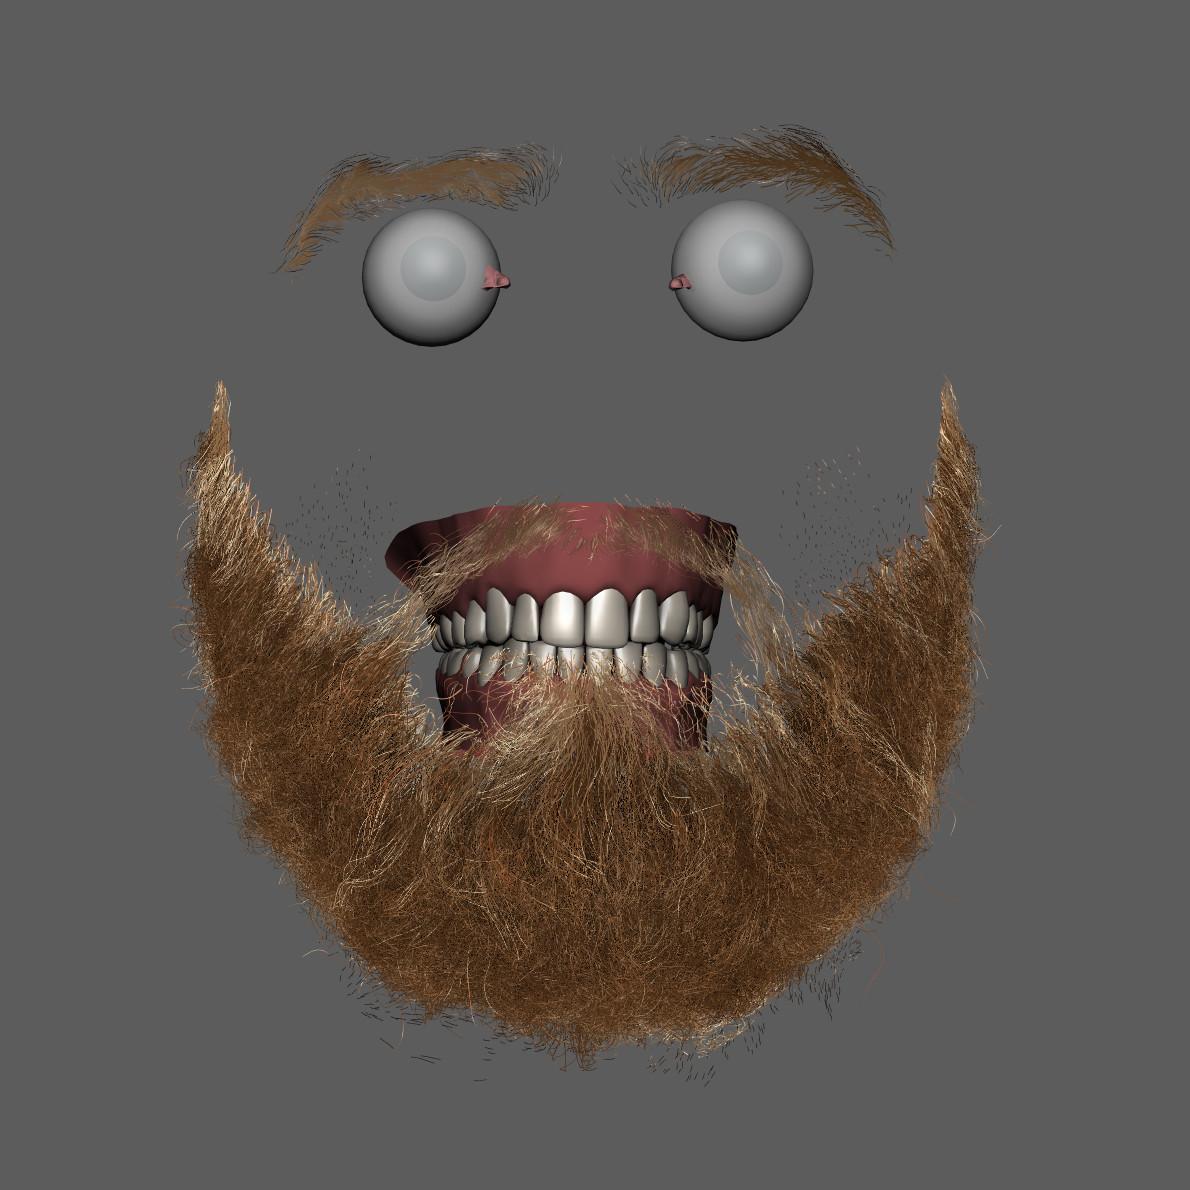 Bonus: Angry Beard